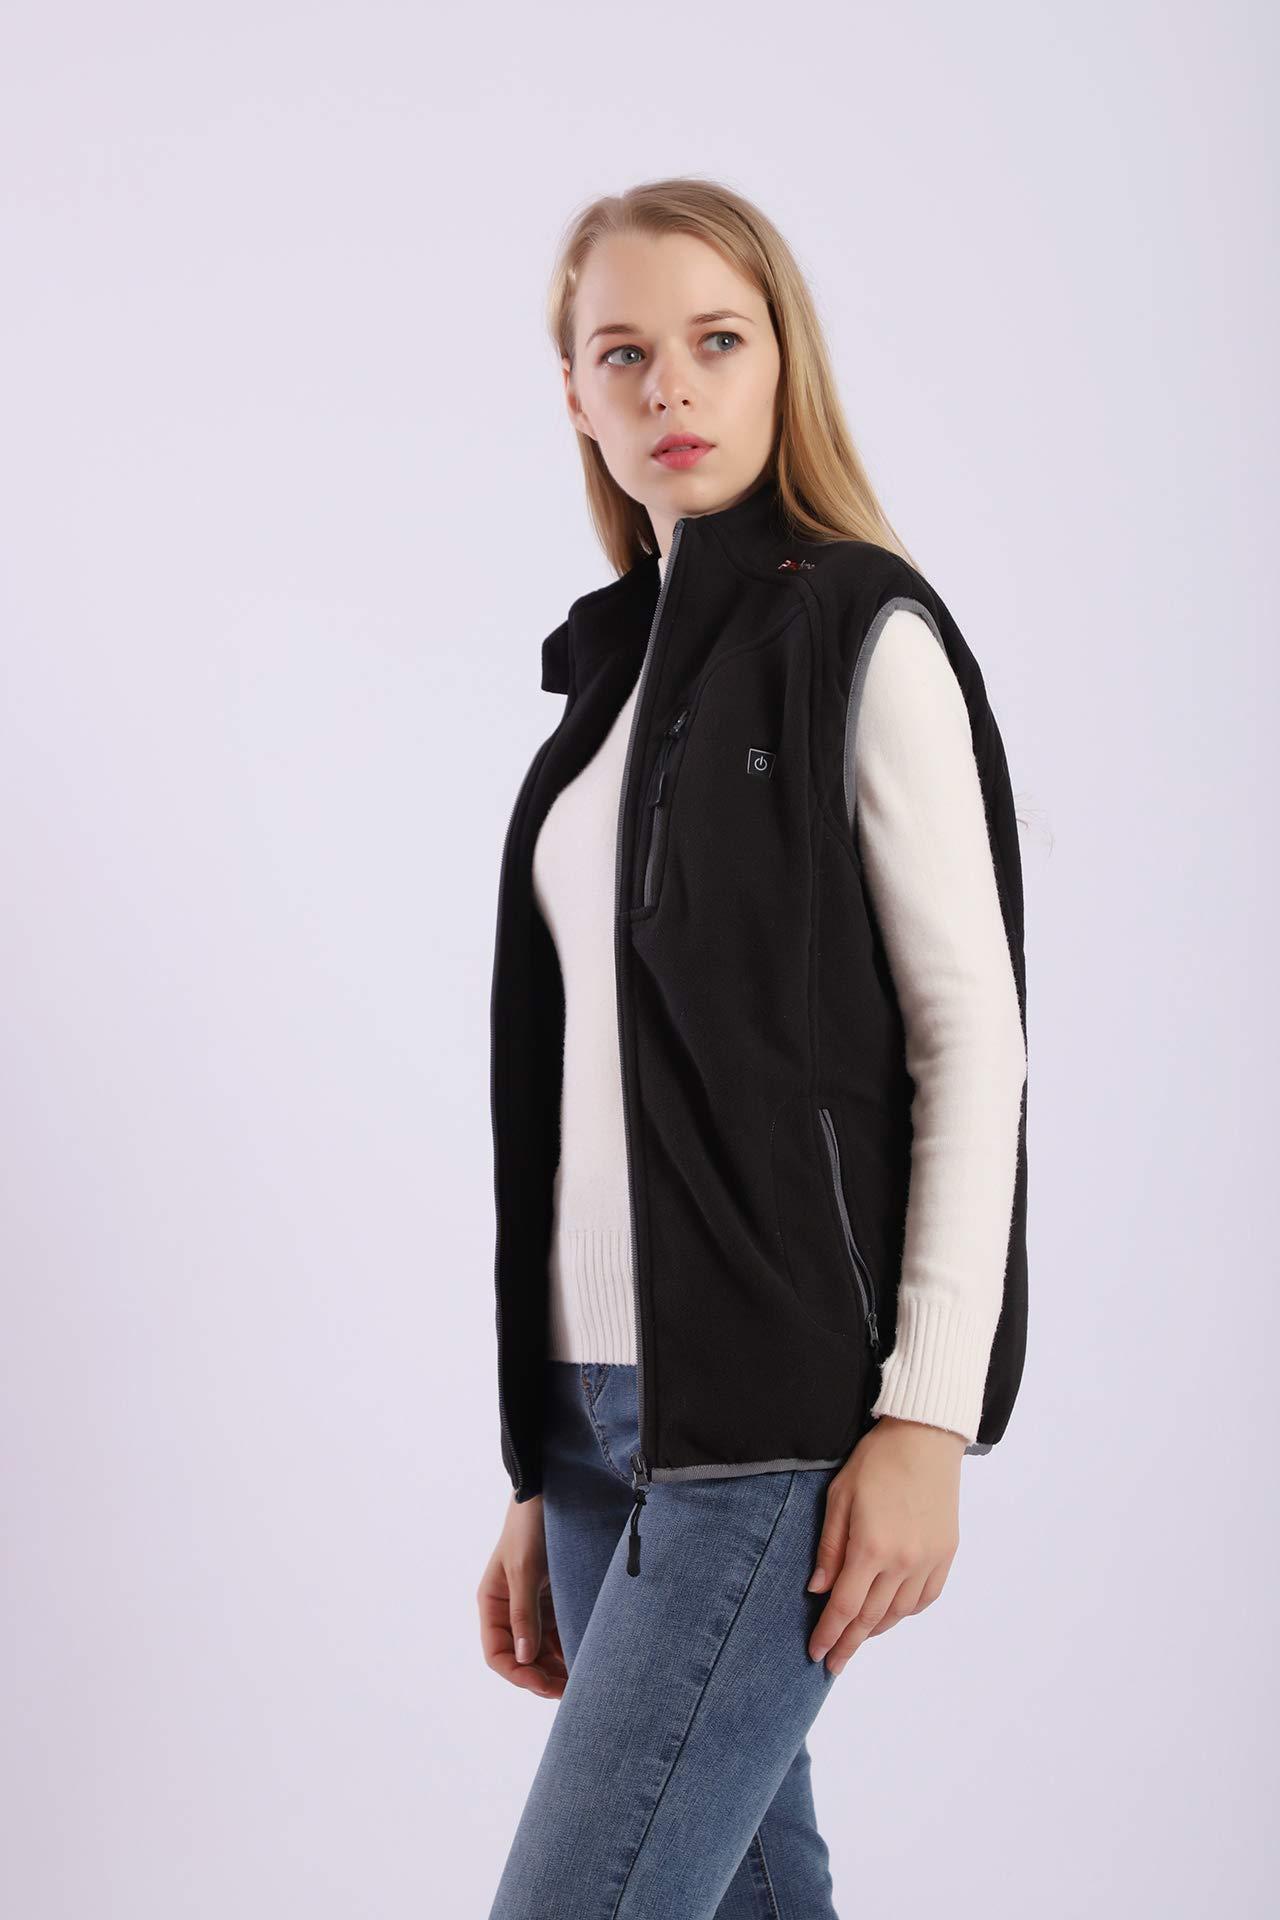 Prosmart Heated Vest Polar Fleece Lightweight Waistcoat with USB Battery Pack (XS) by PROSmart